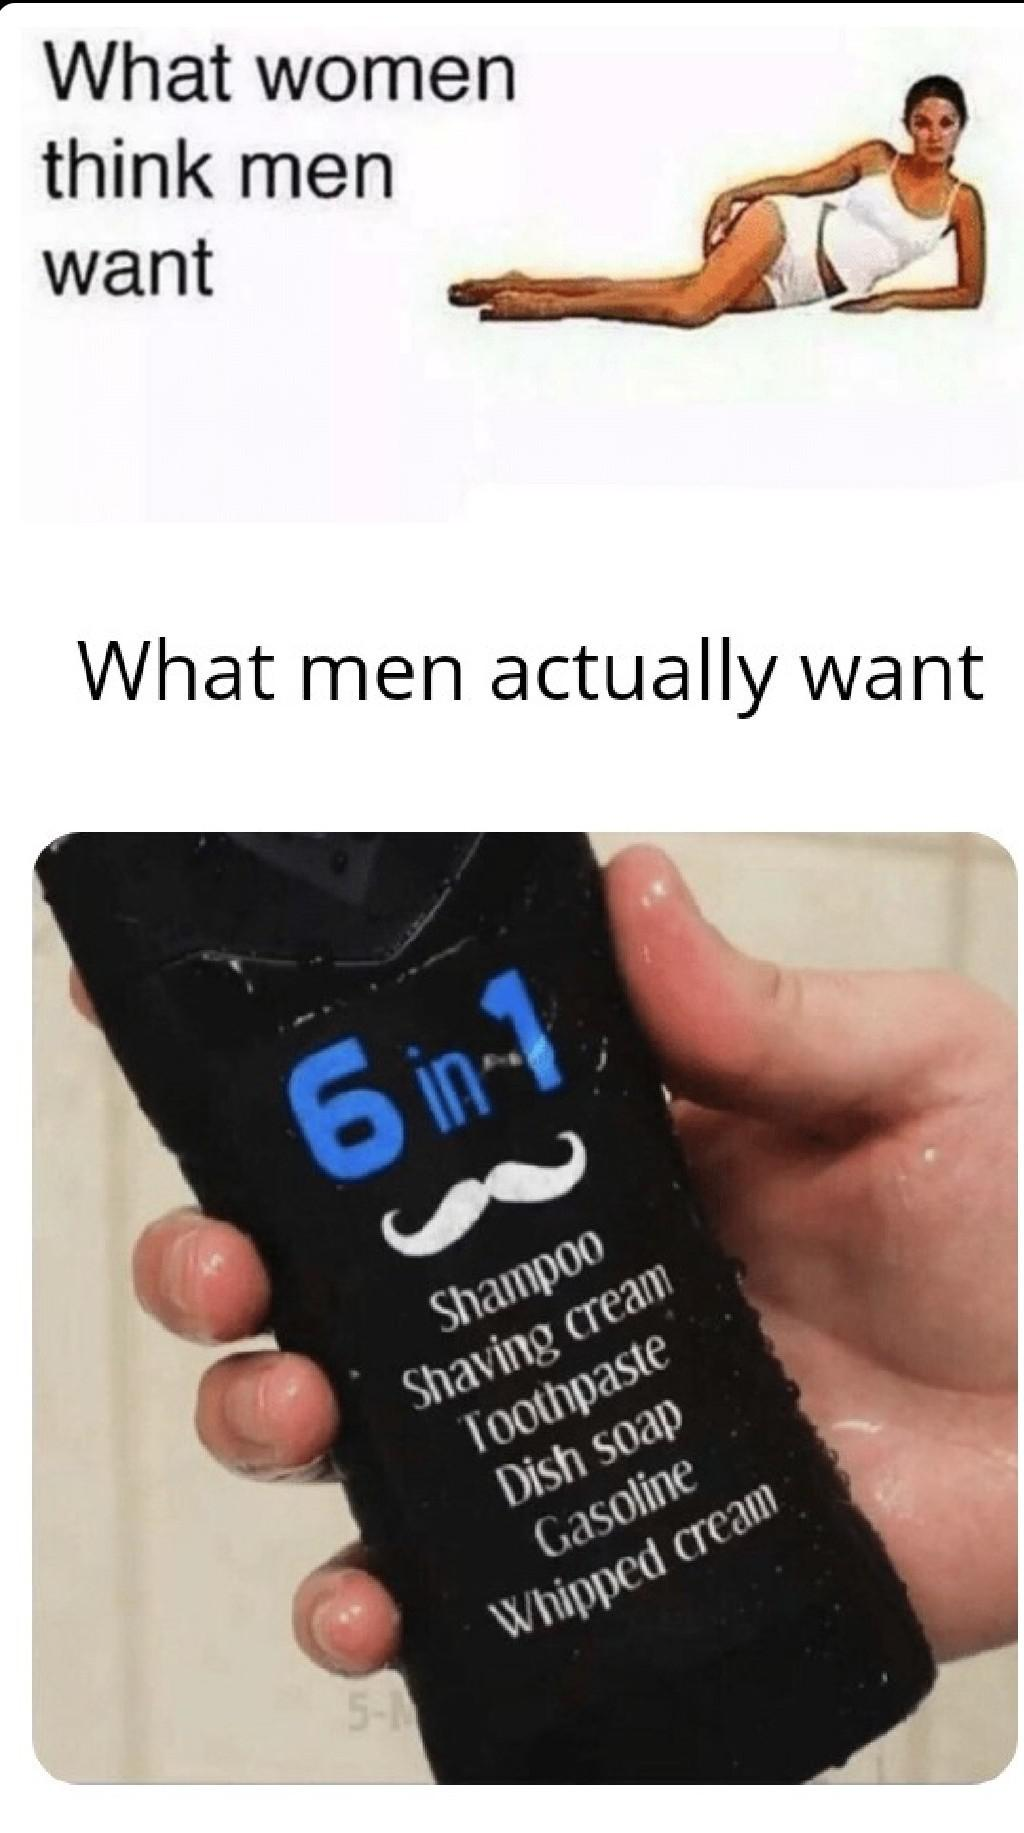 6 In 1 Shampoo Meme : shampoo, Shampoo, R/memes